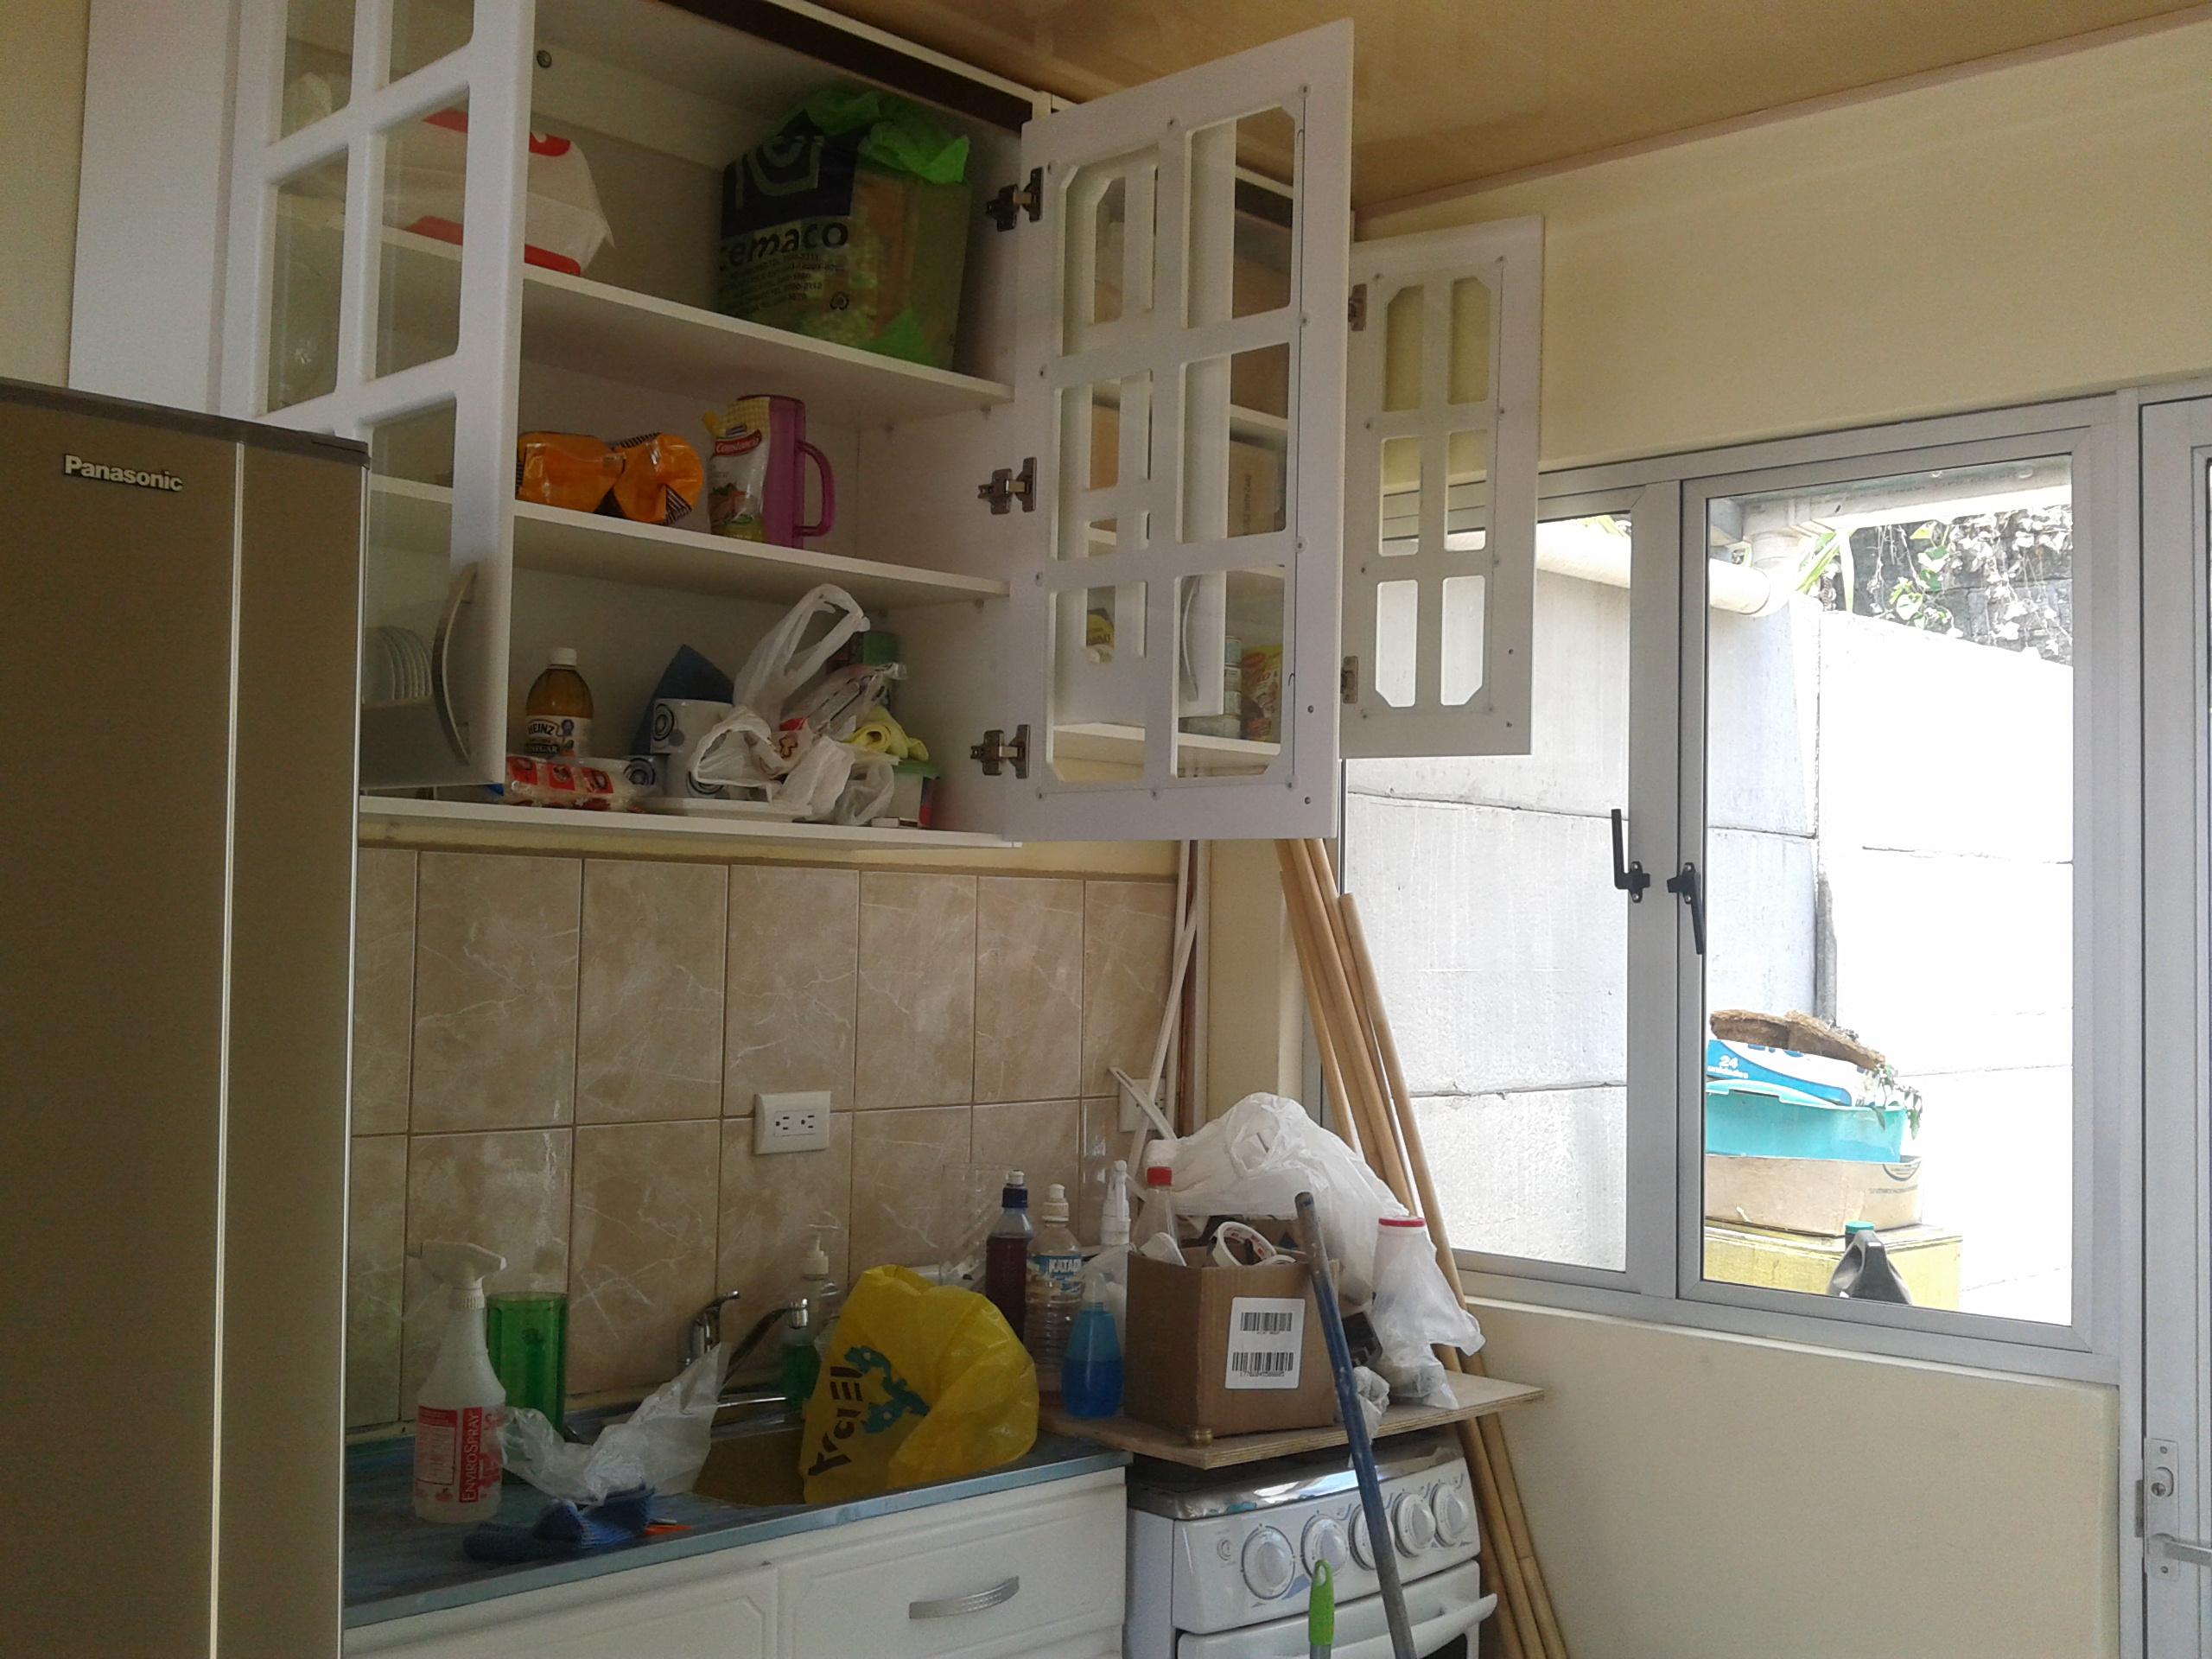 Organizaci n profesional mueble de cocina mi casa organizada for Cocina profesional en casa